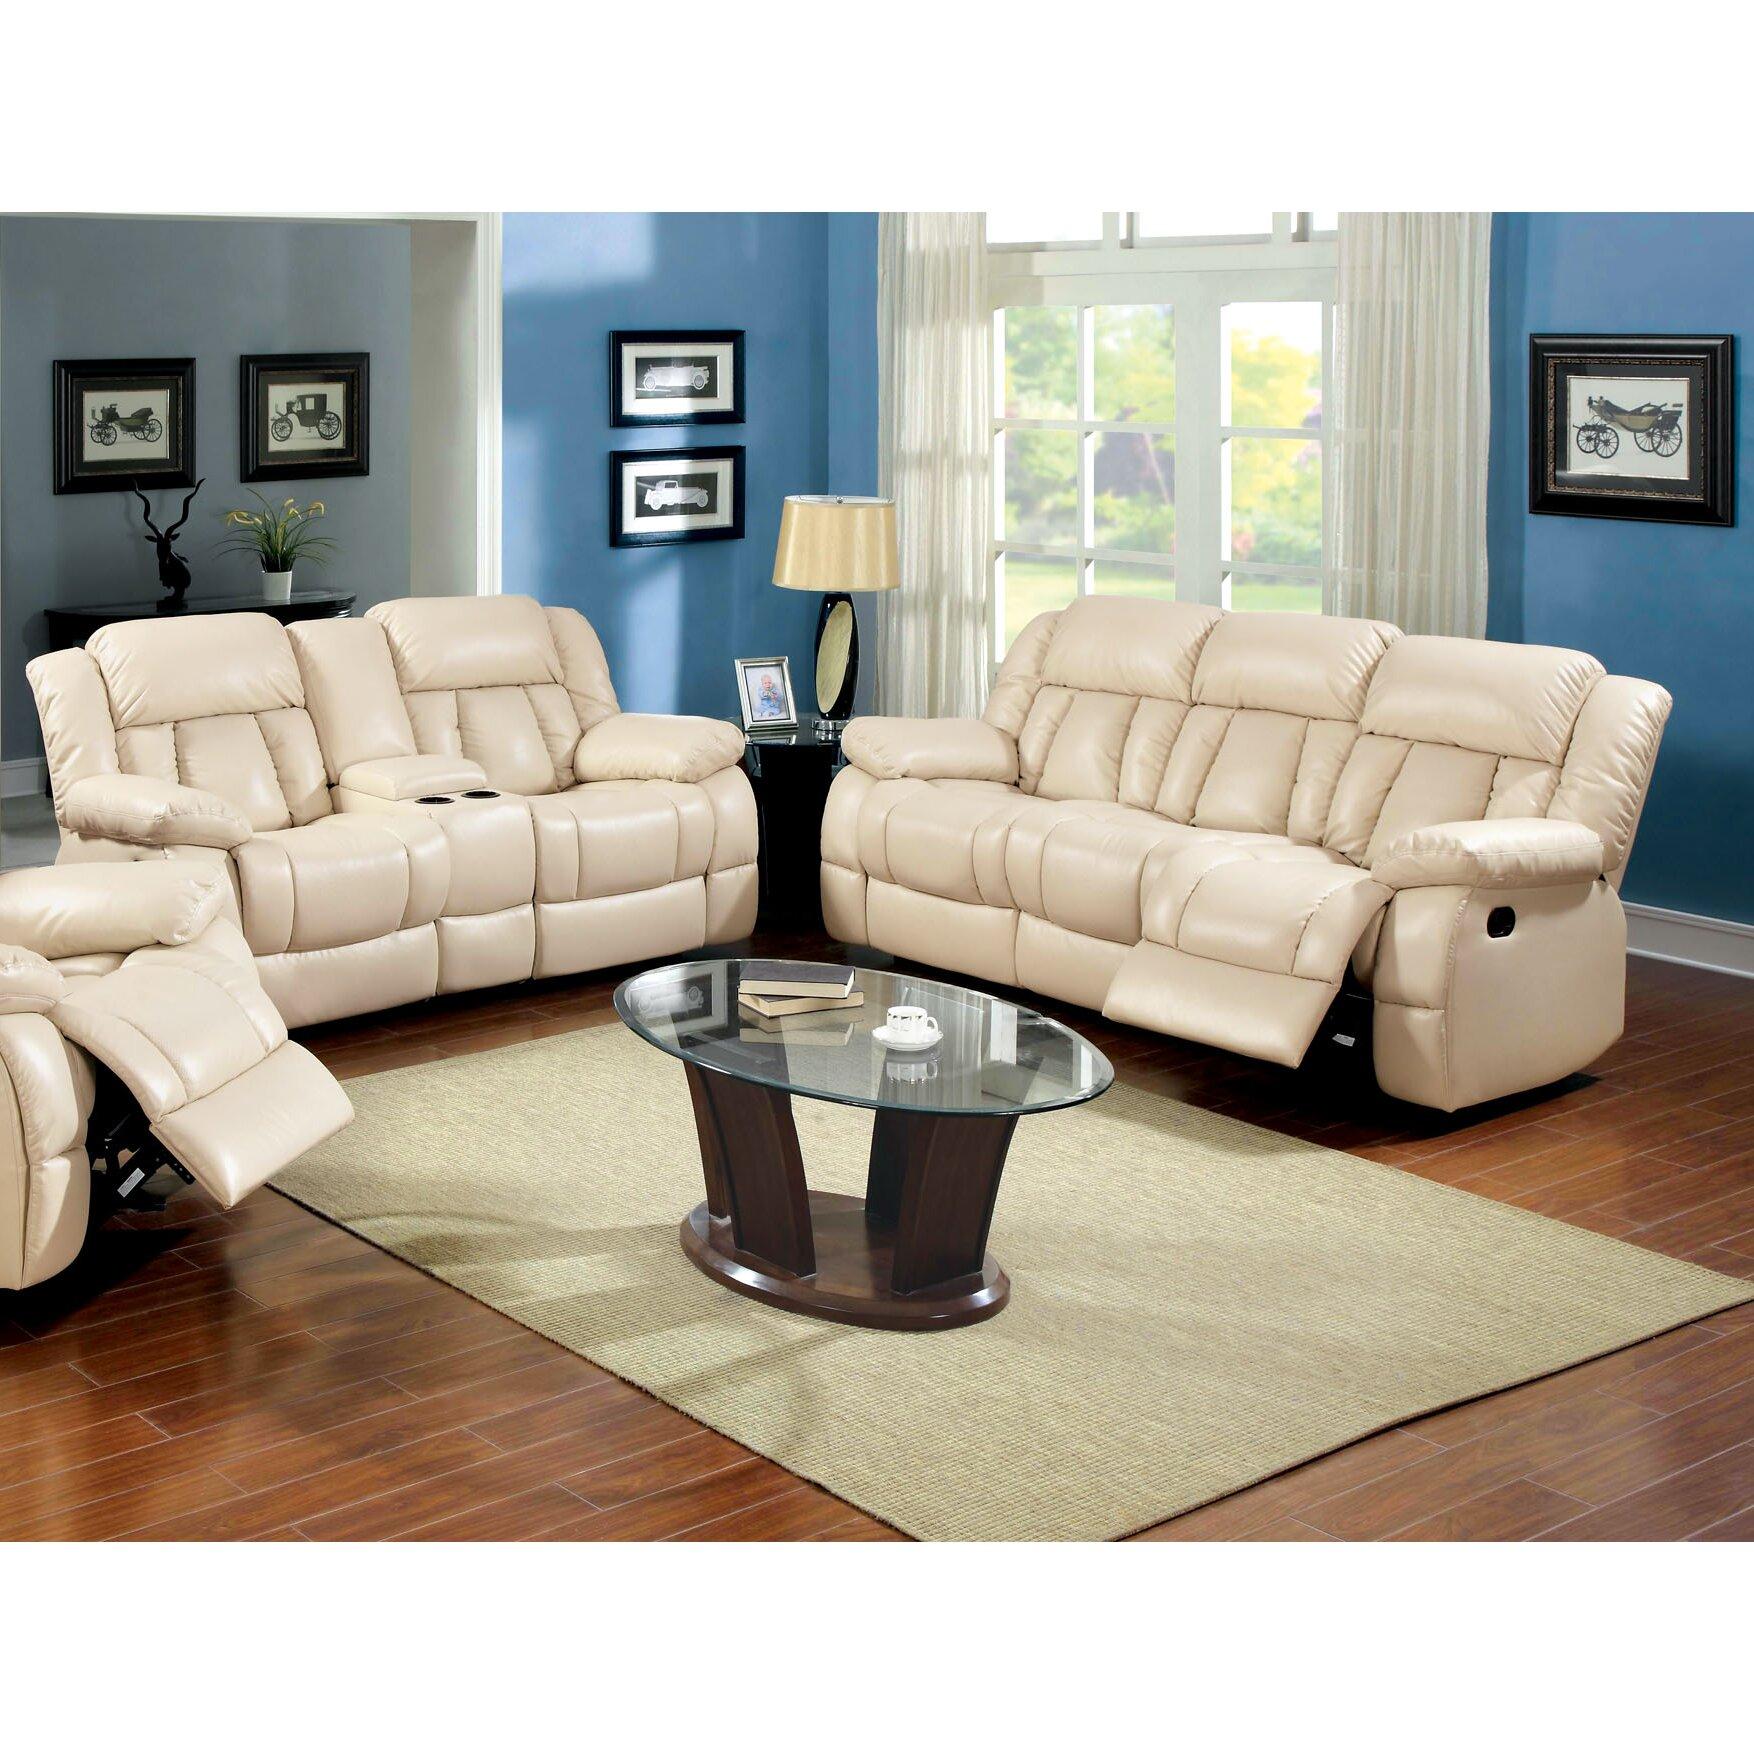 Hokku designs carlmane living room collection reviews for Hokku designs living room furniture